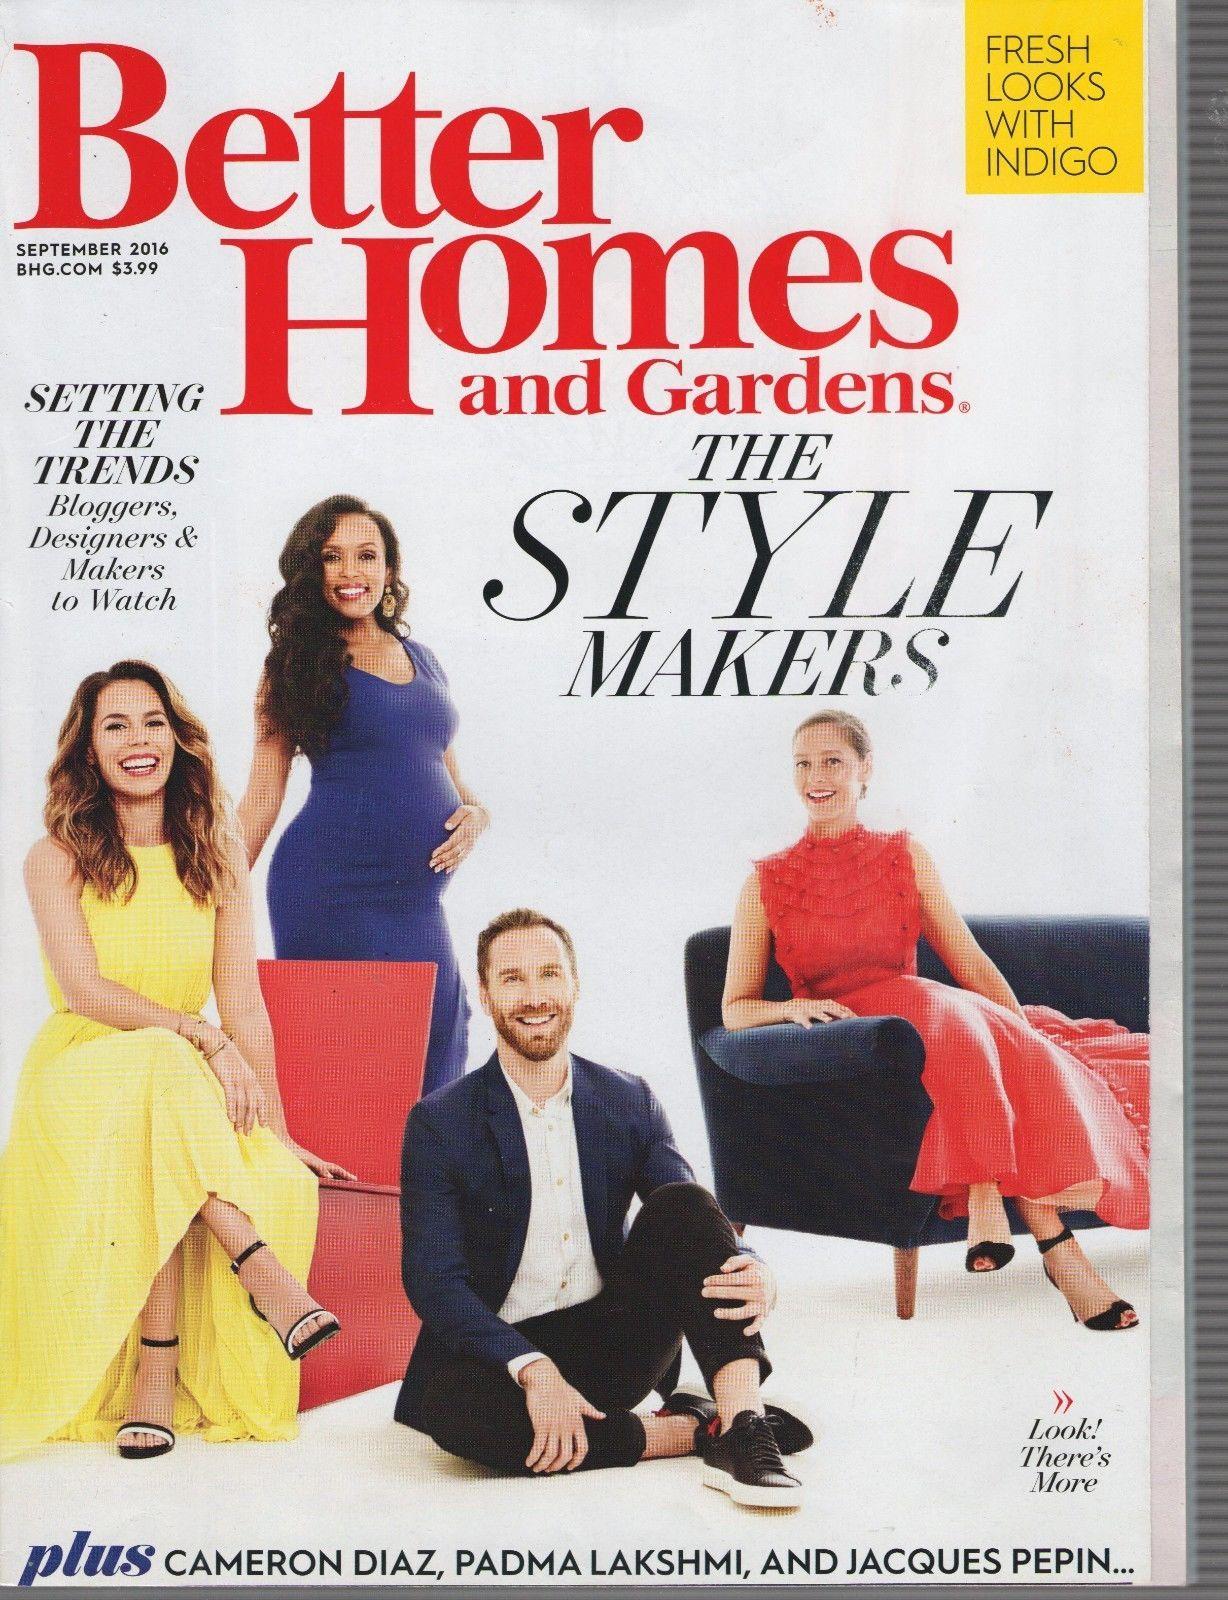 dbf7d48e69a8310e854f63ea87287088 - Better Homes And Gardens Sweepstakes 2016